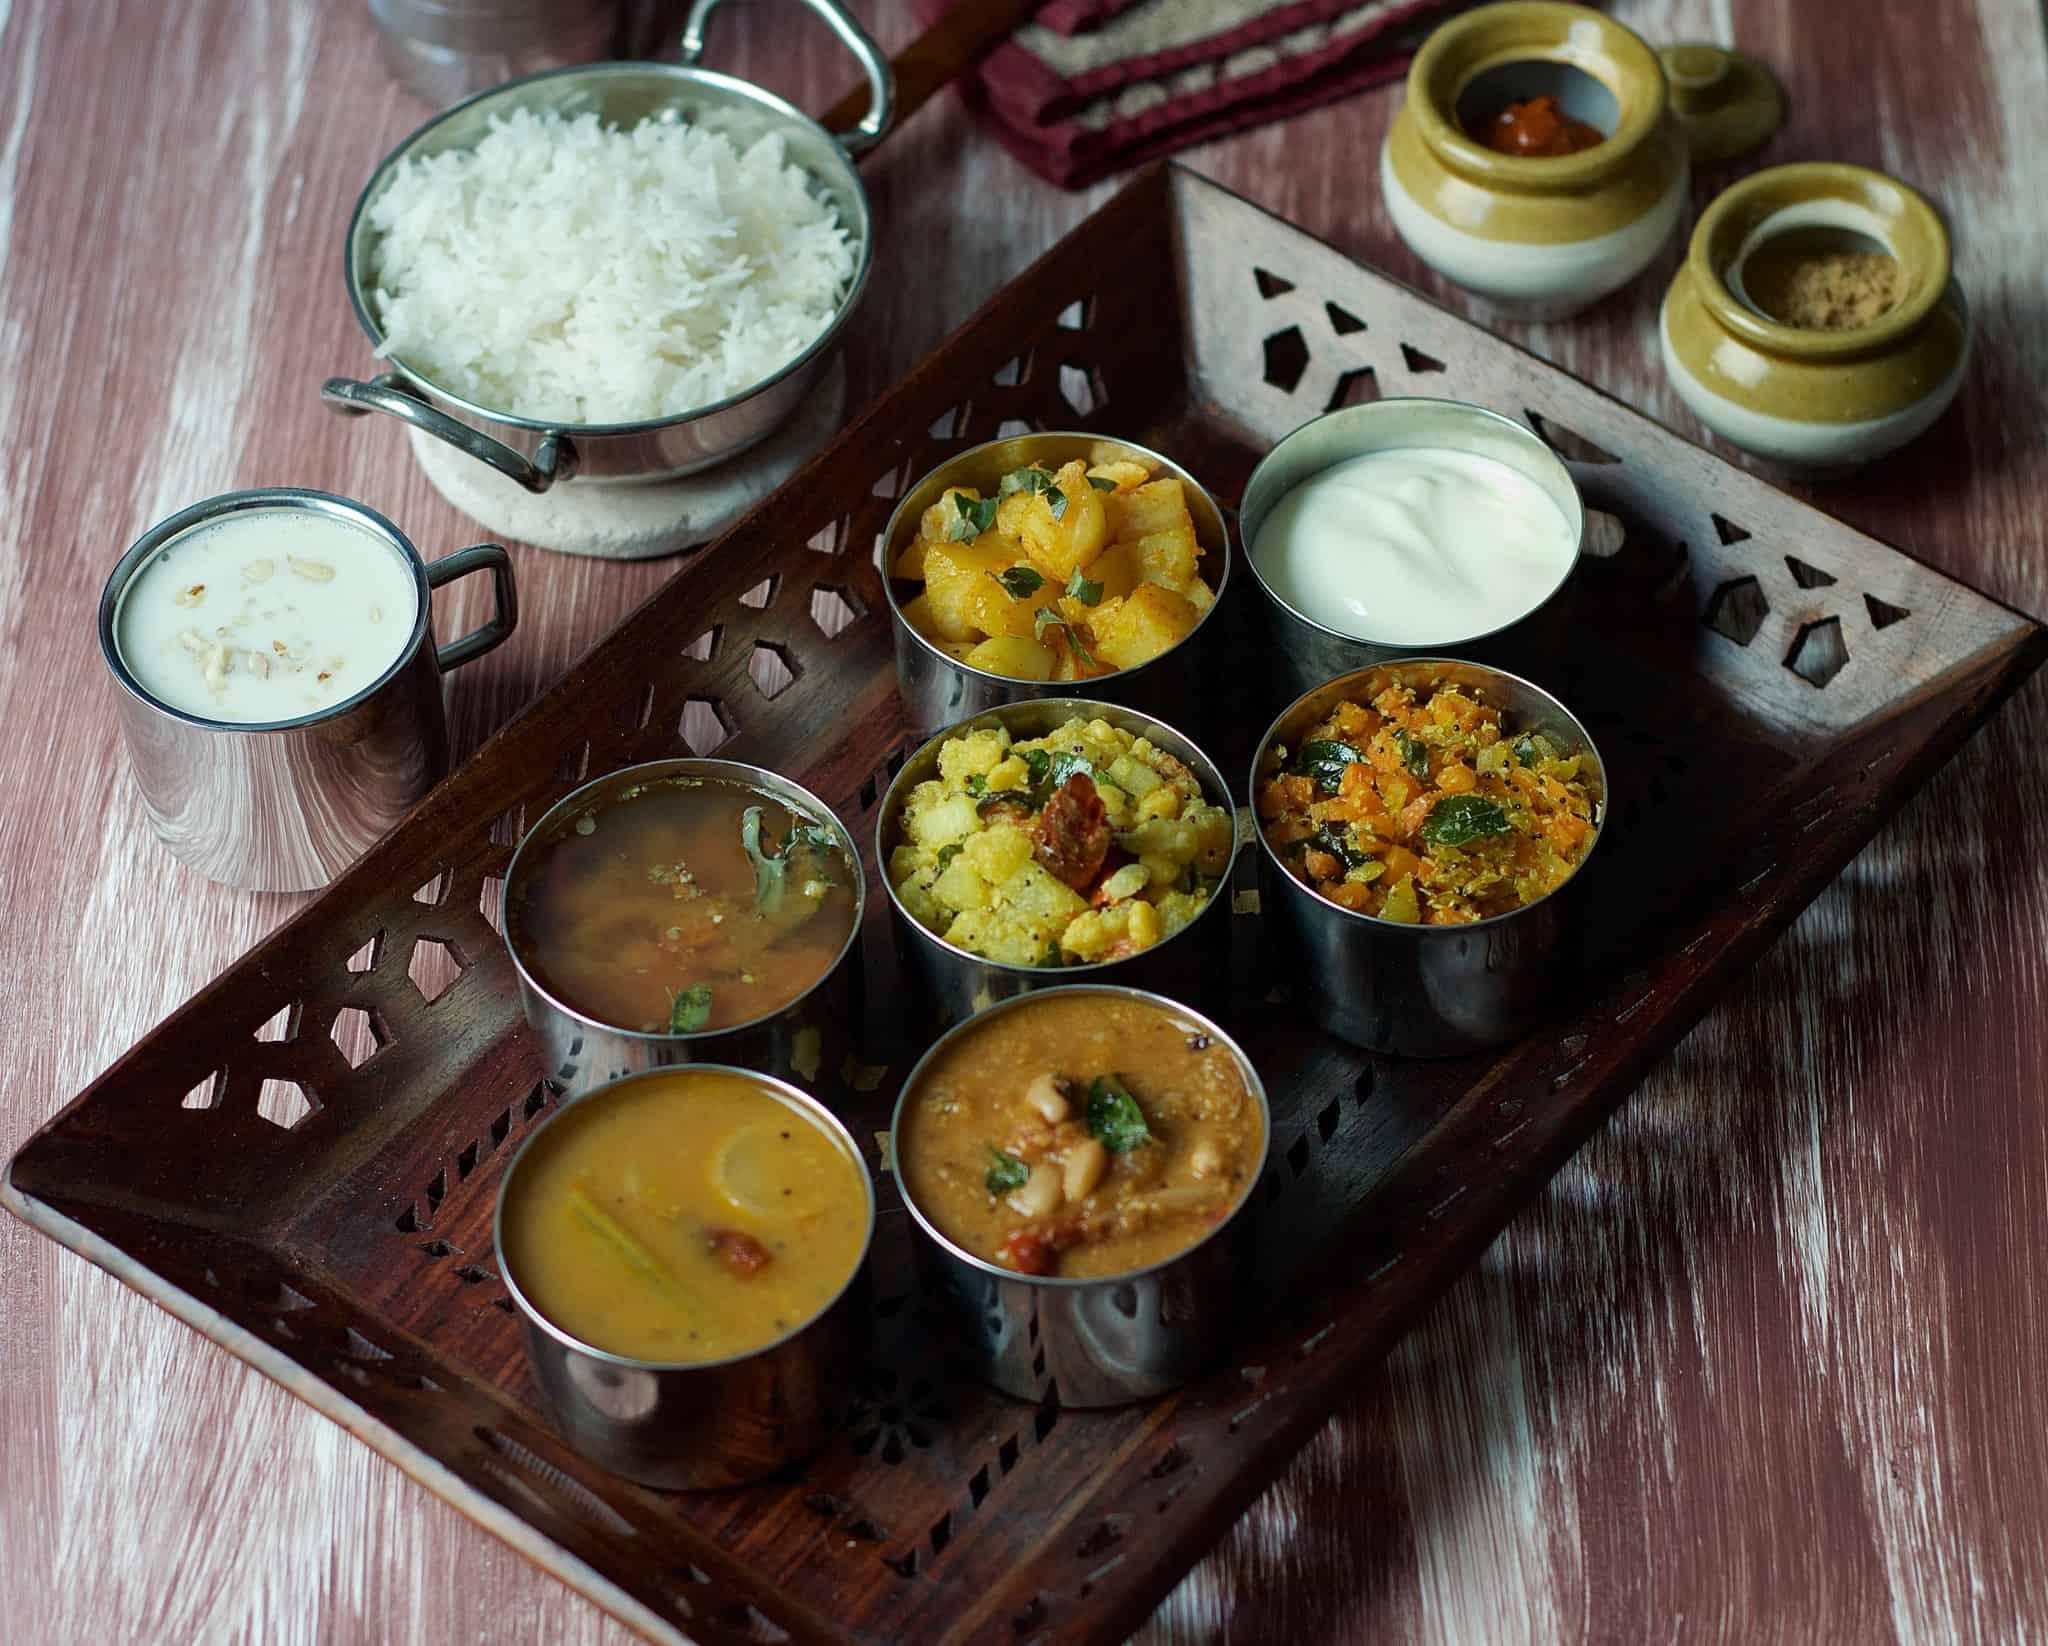 Restuarant style Tamil Nadu Thali